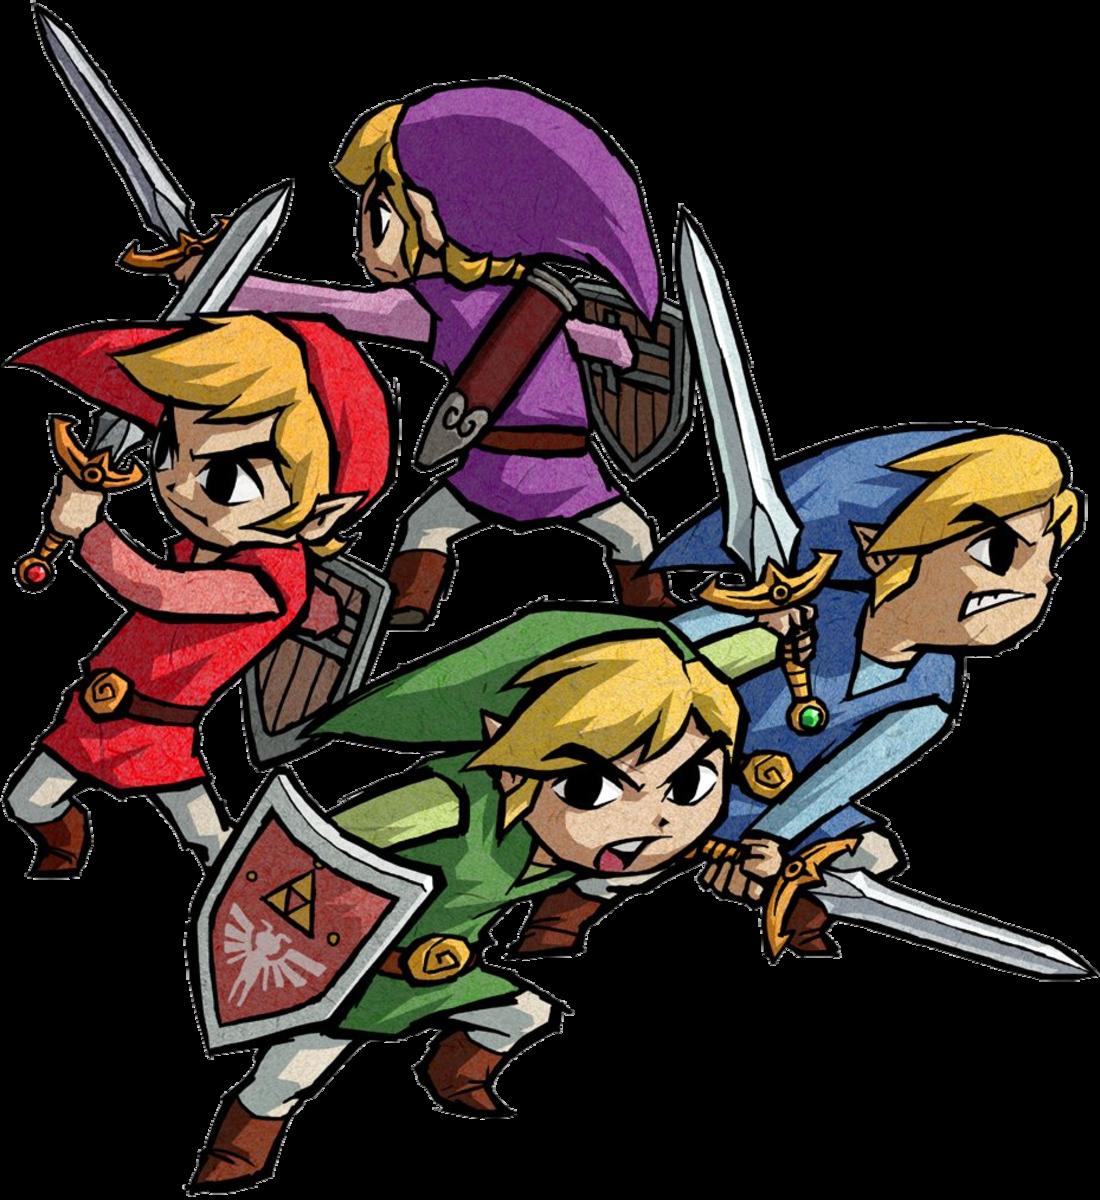 Link's Four Sword Forms